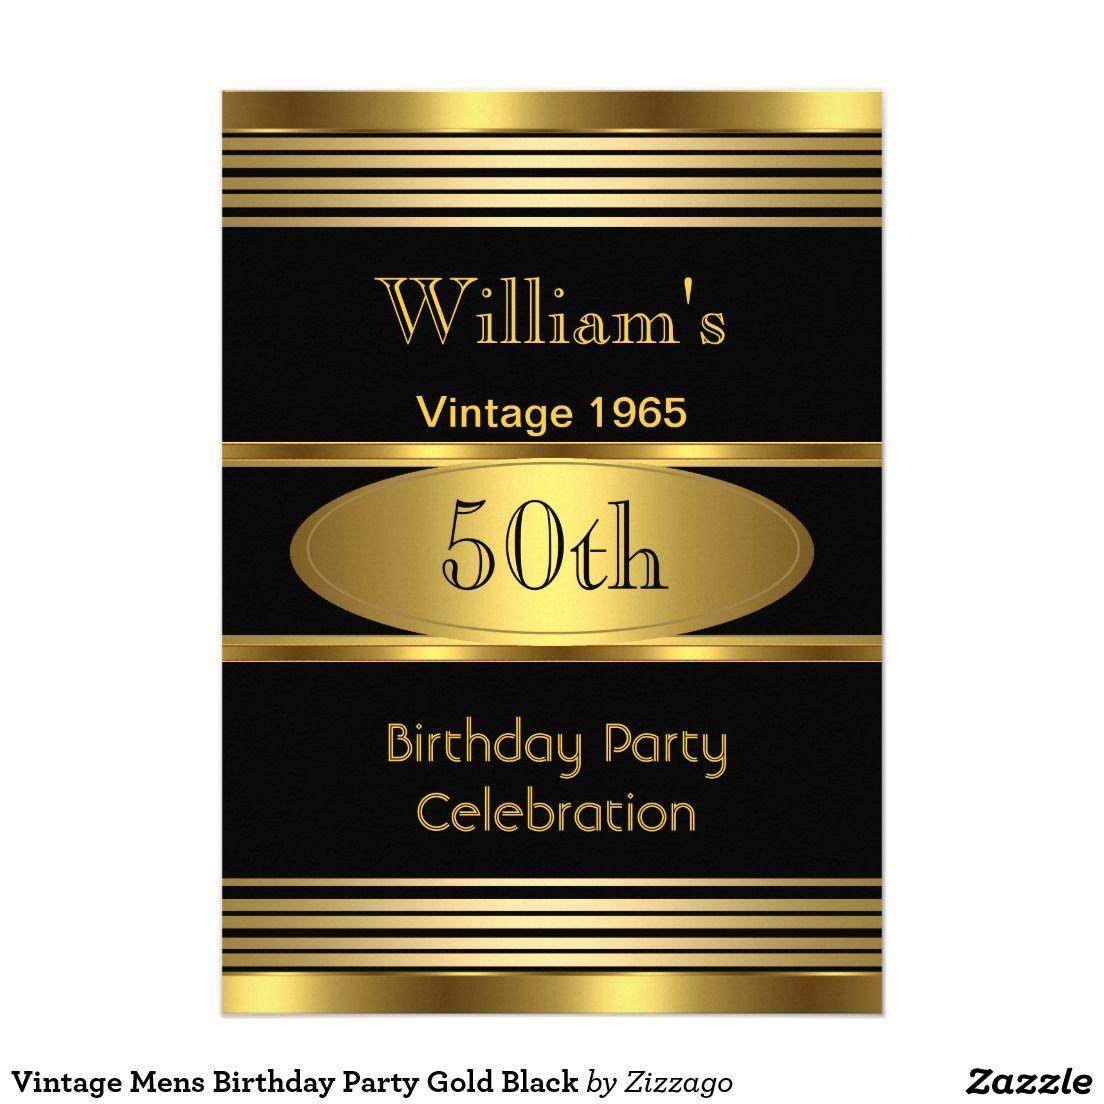 Vintage Mens Birthday Party Gold Black Card